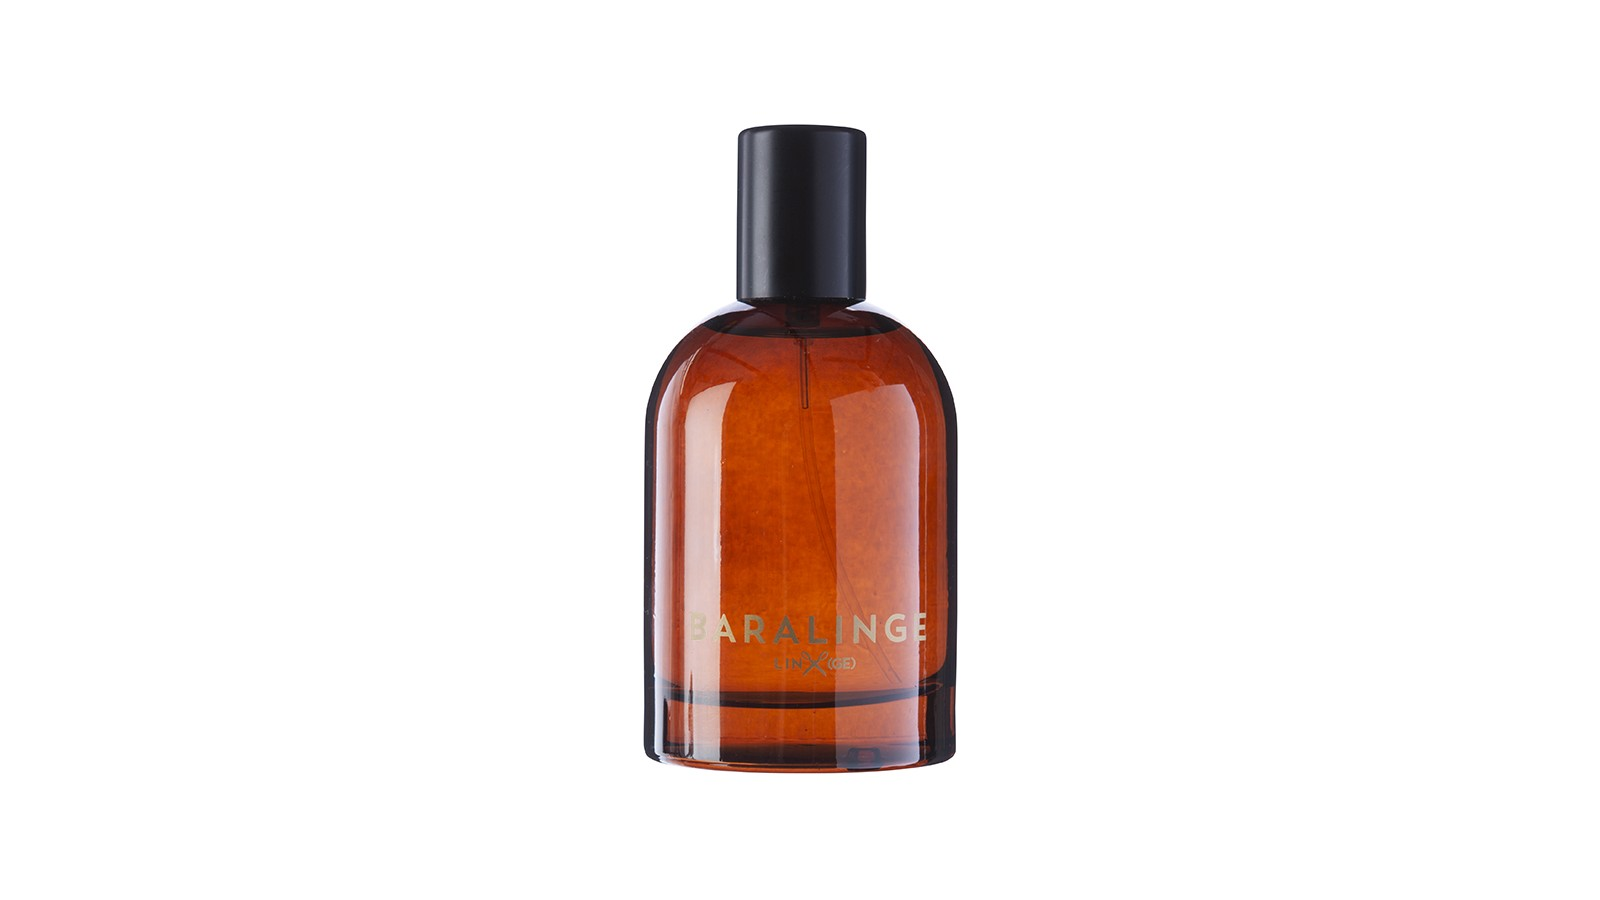 Parfum Baralinge